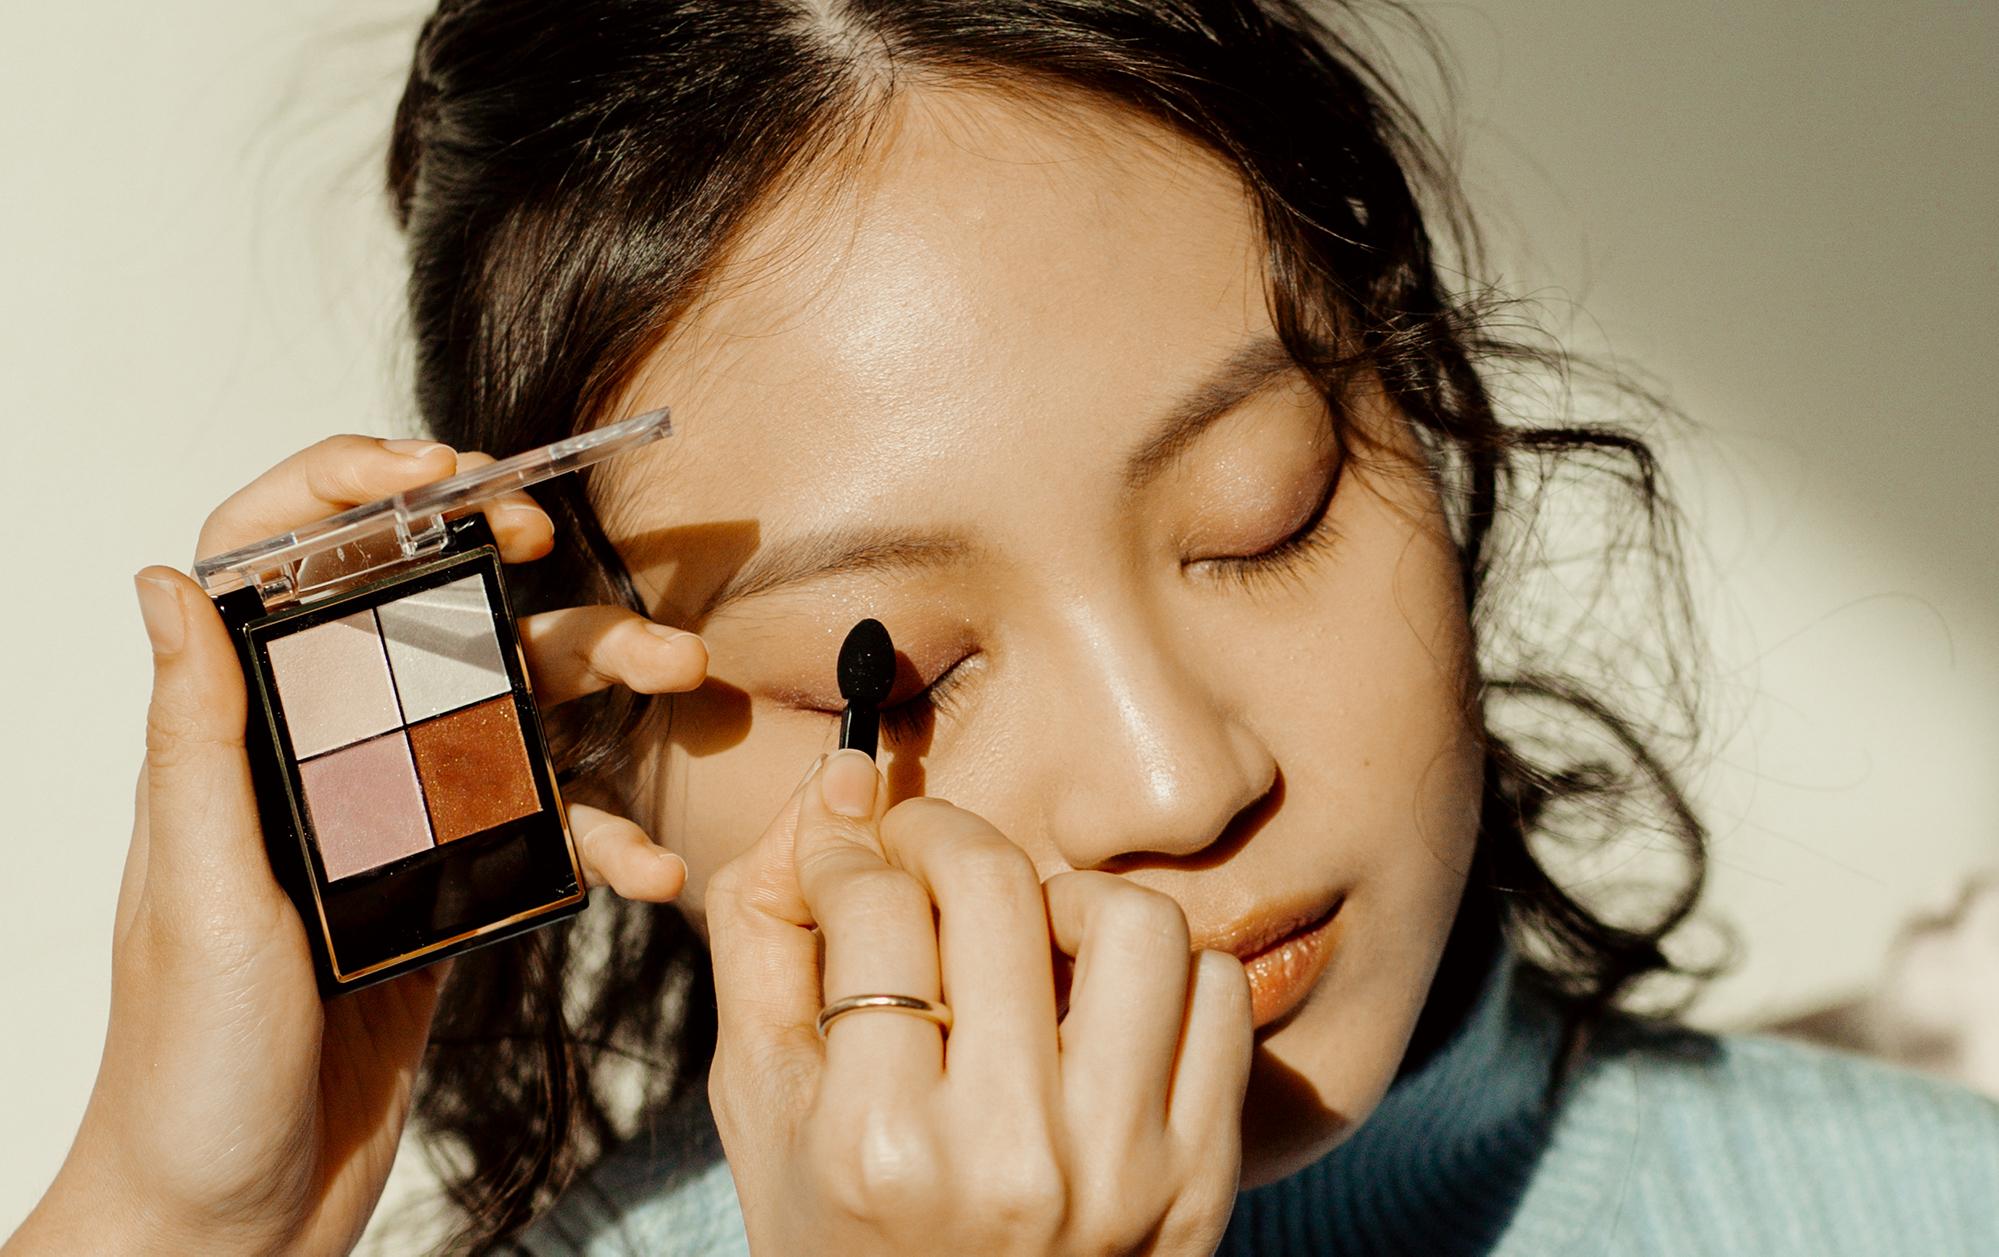 #SheByDC: Buff & Brilliant, A Summer Makeup Edit